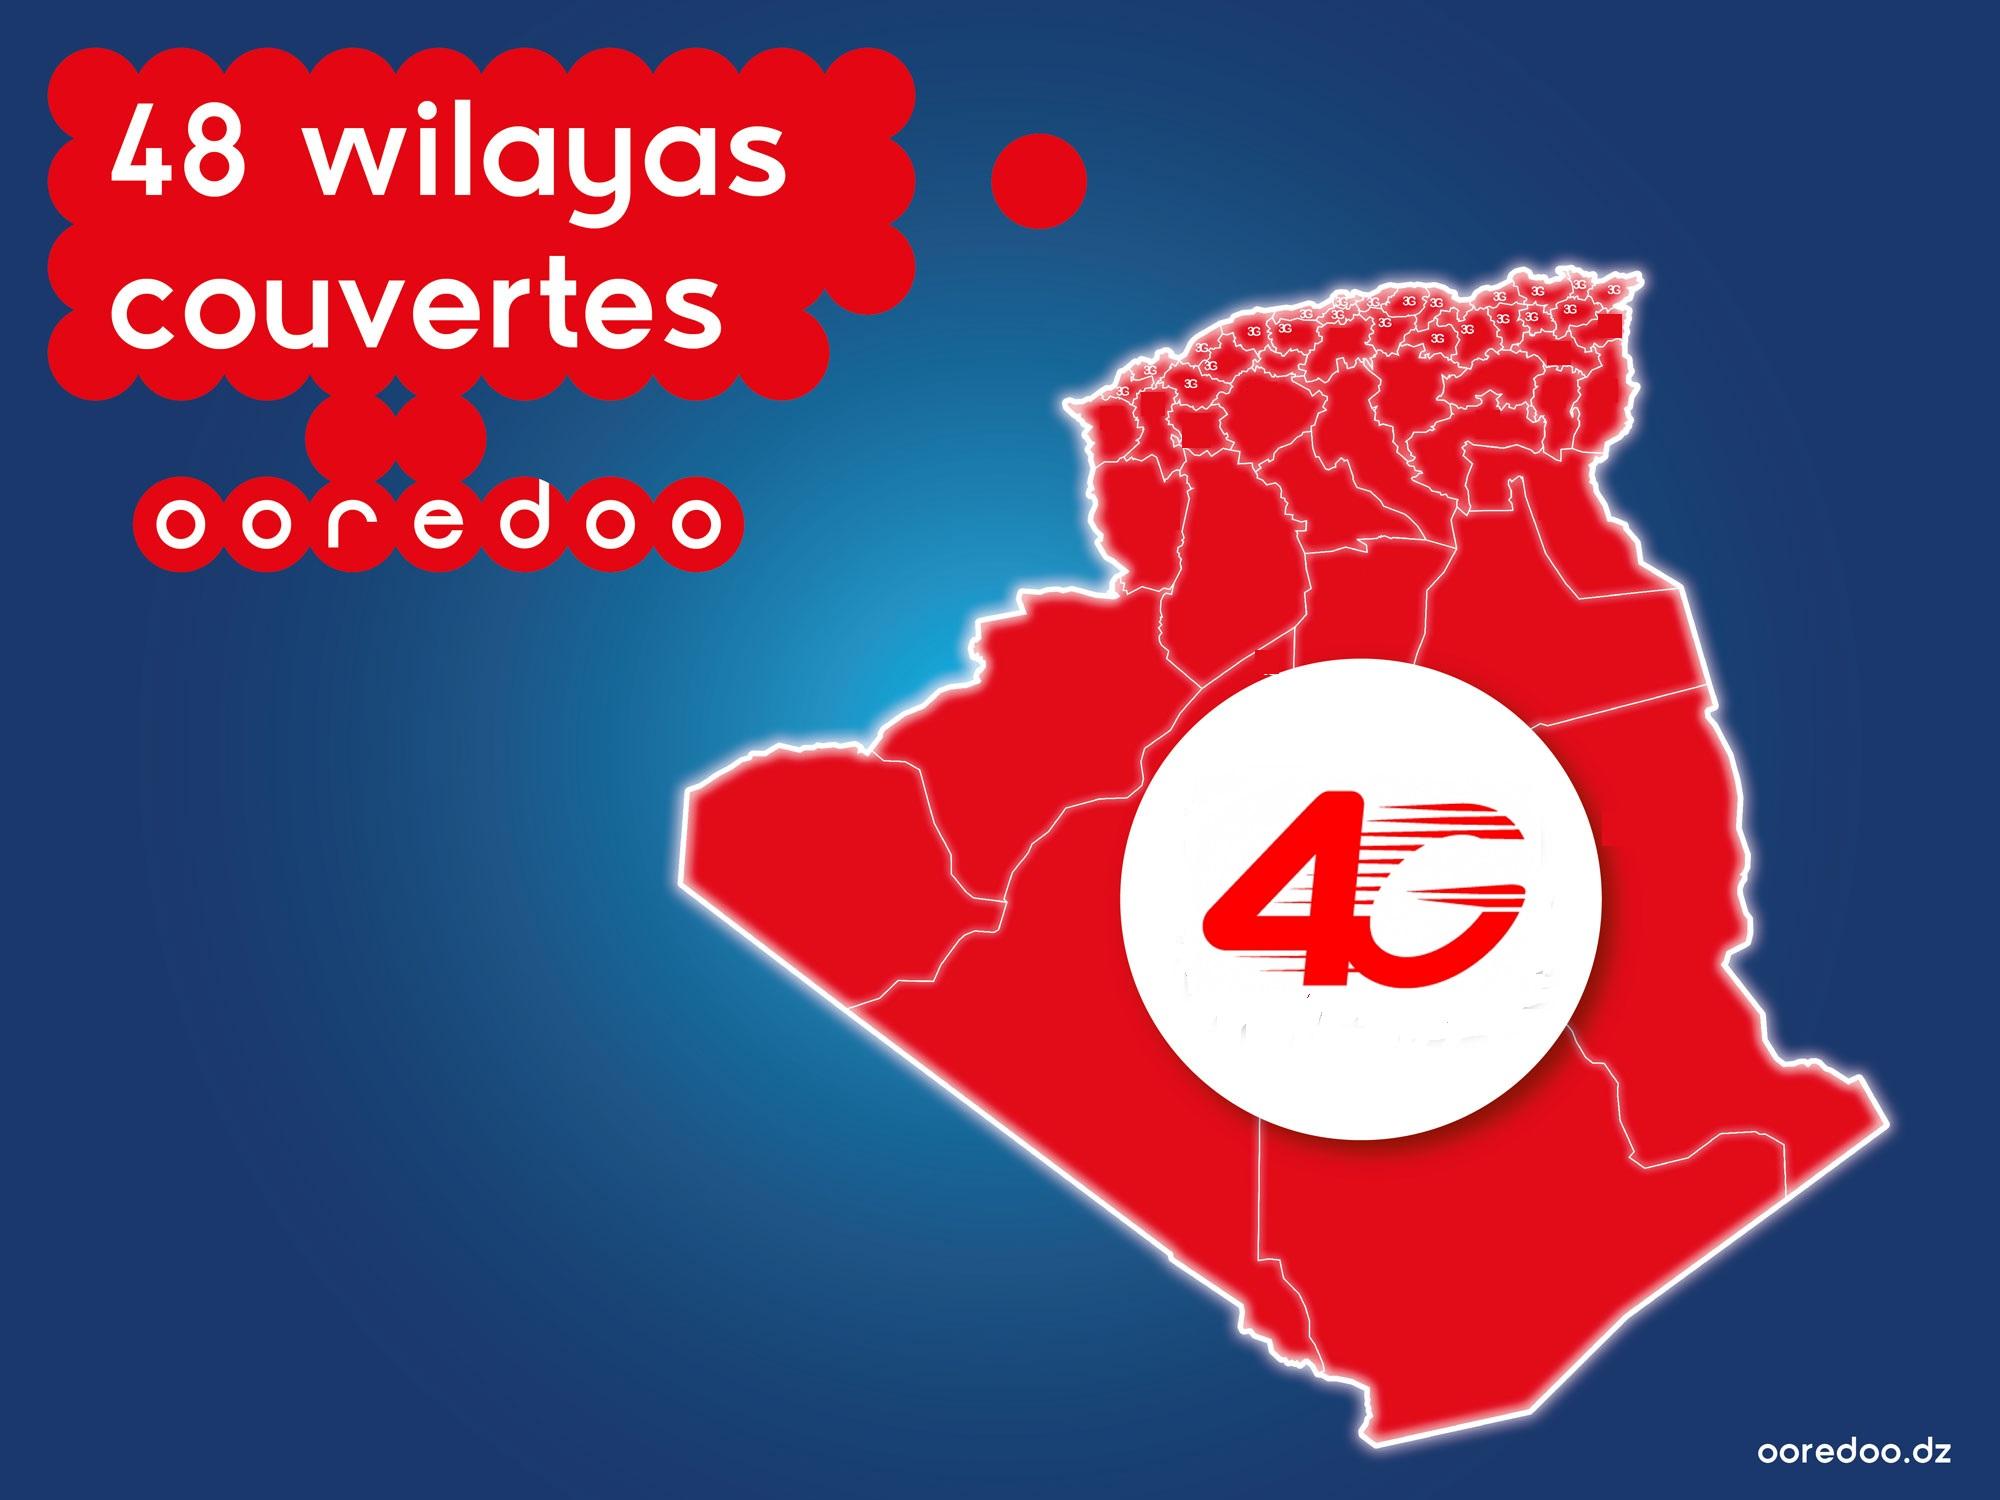 DIA-Ooredoo-couvre-les-48-wilayas-en-4G